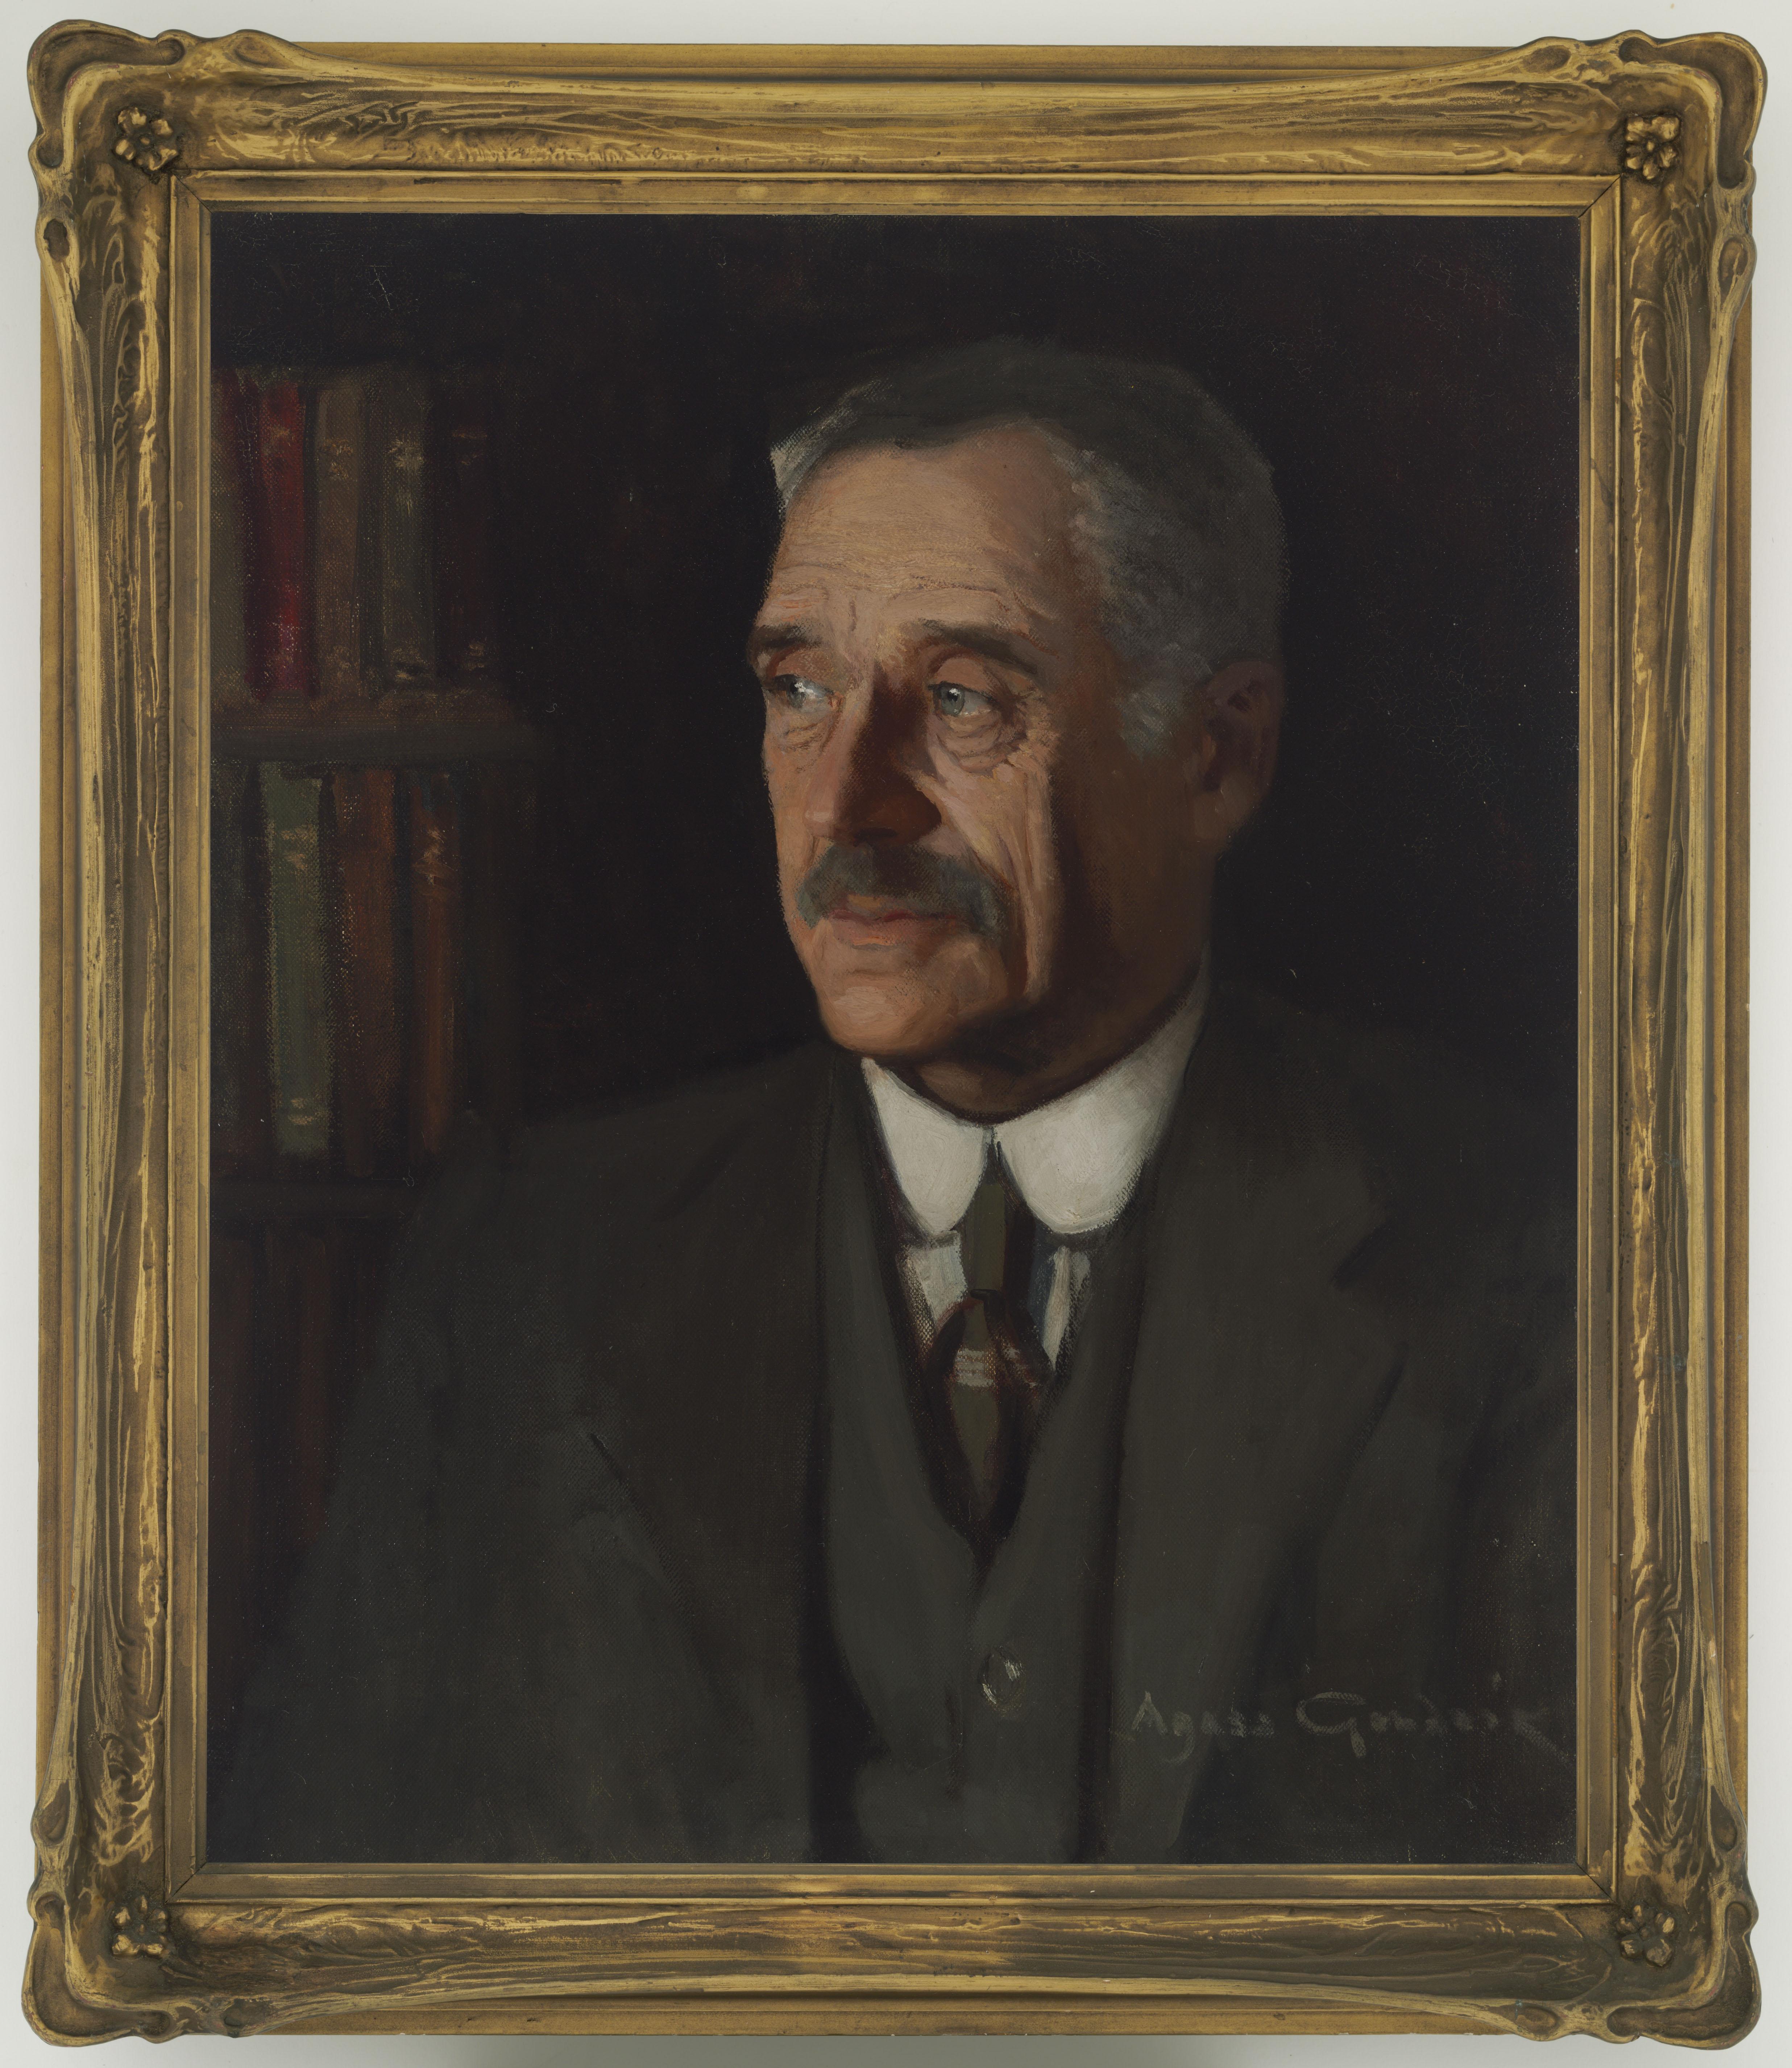 A. B. Paterson, Banjo : portrait in oils, 1927 / Agnes Noyes Goodsir